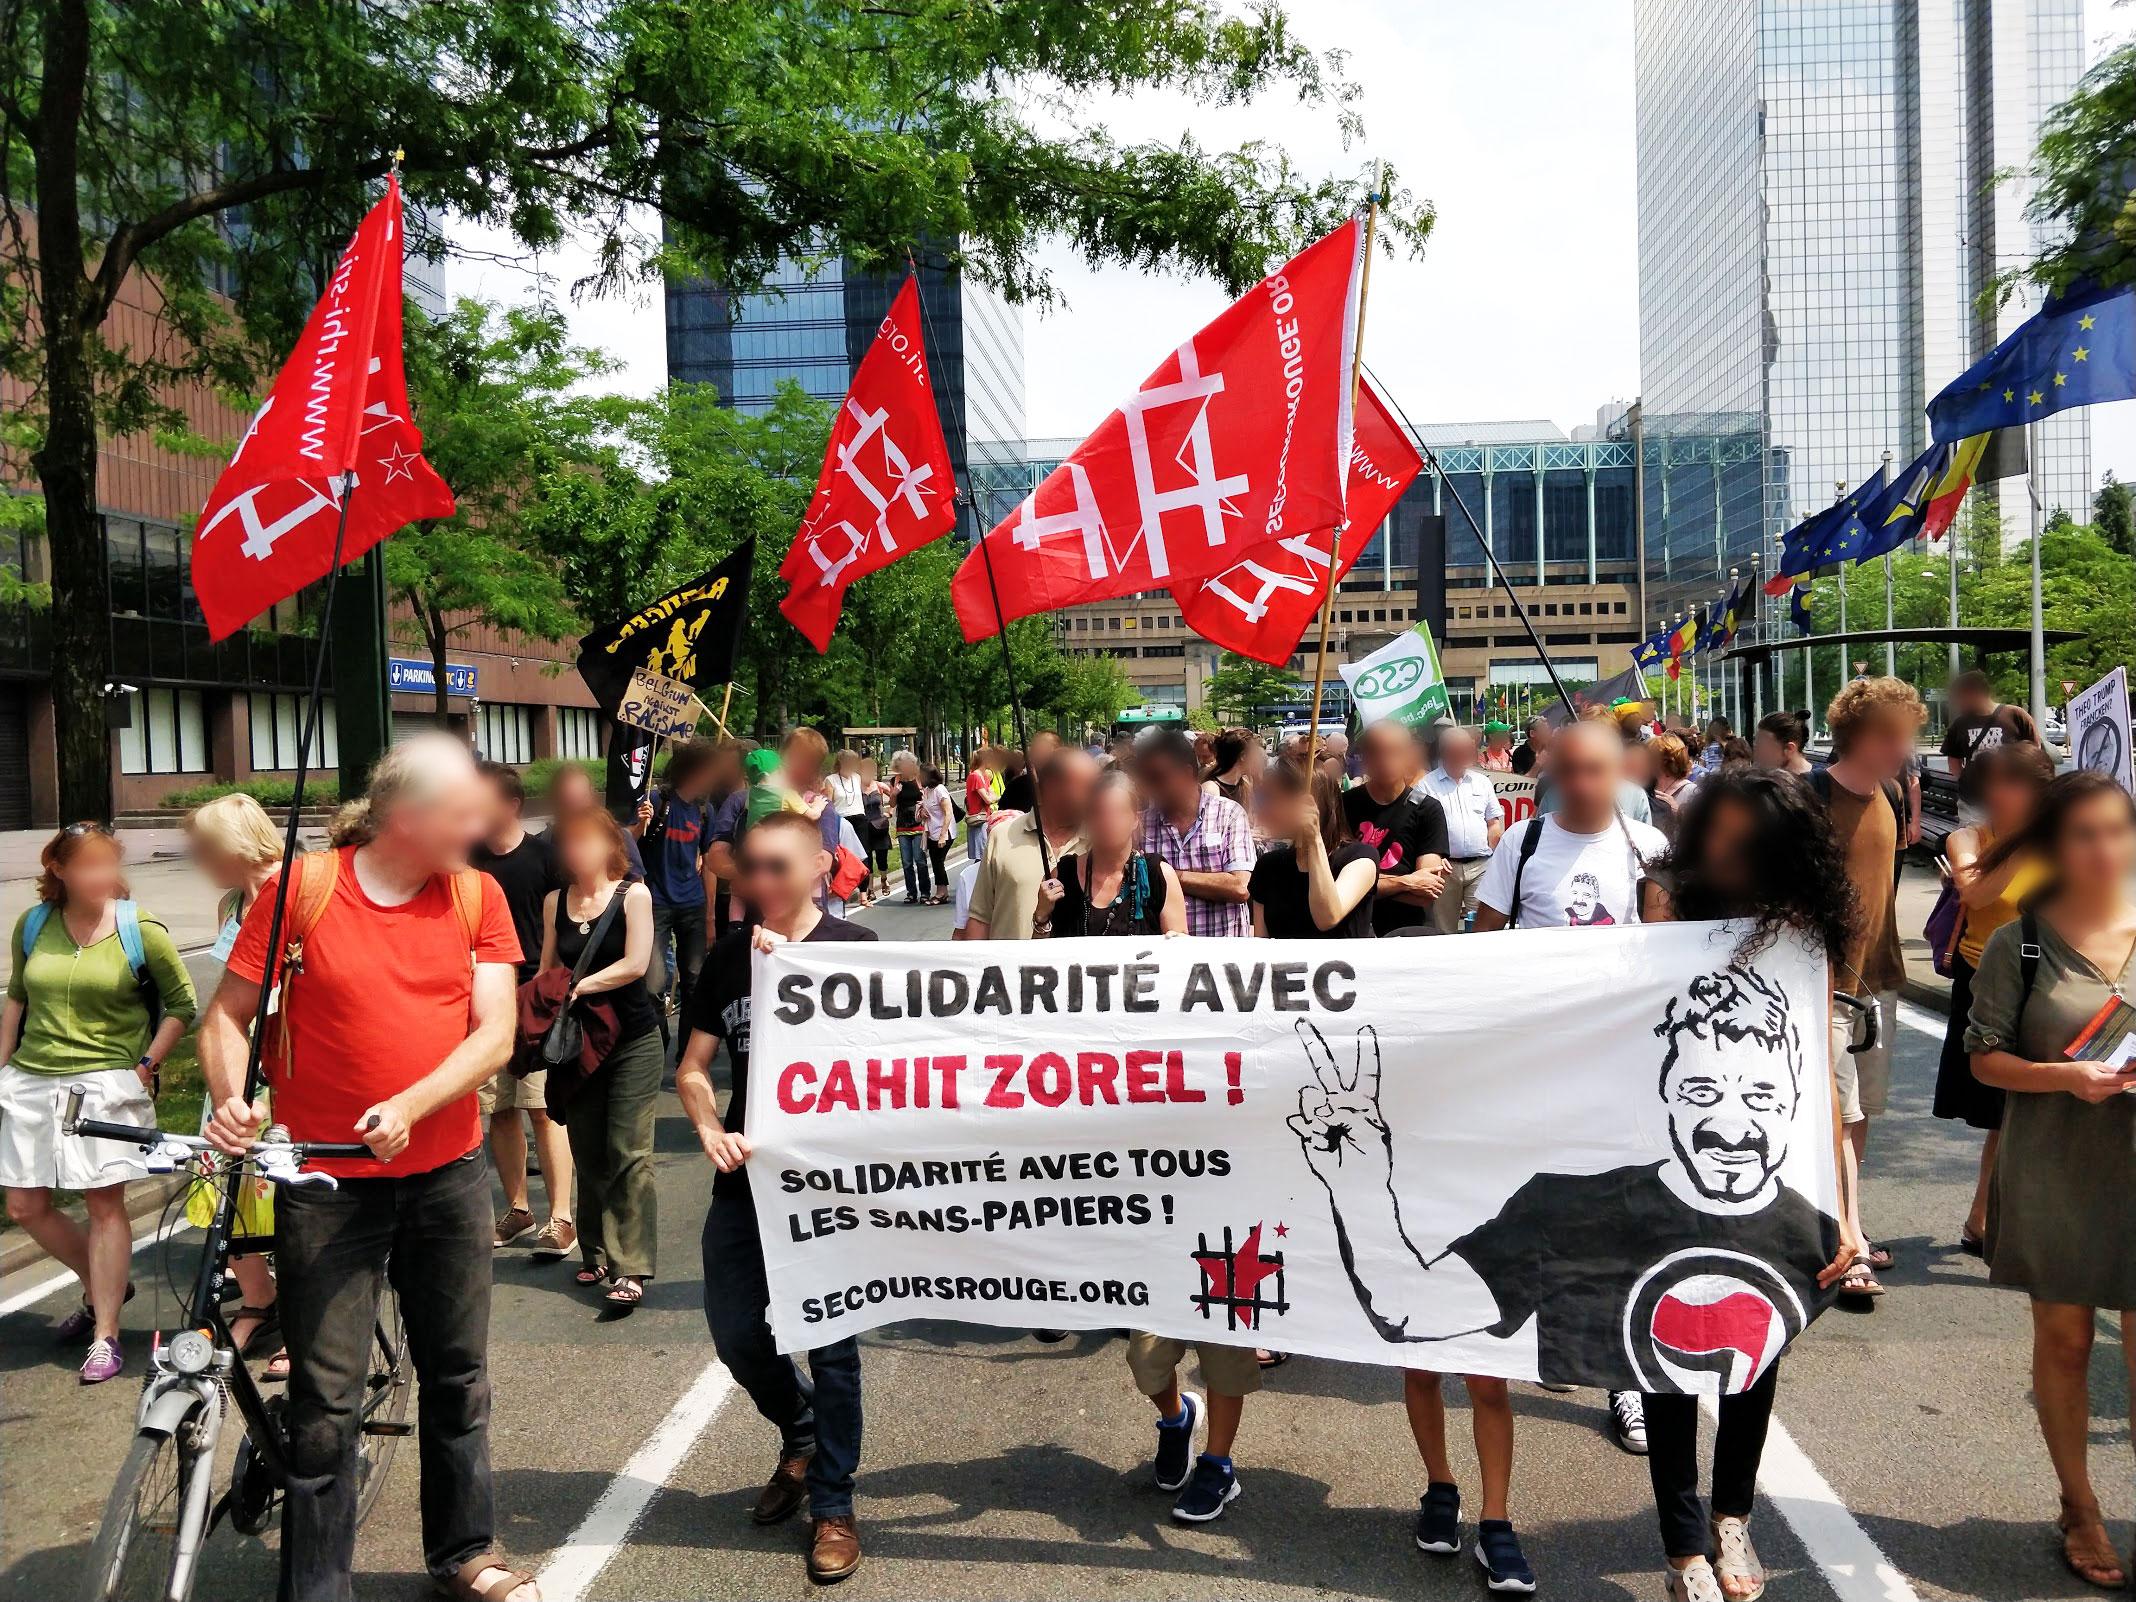 Solidarité avec Cahit